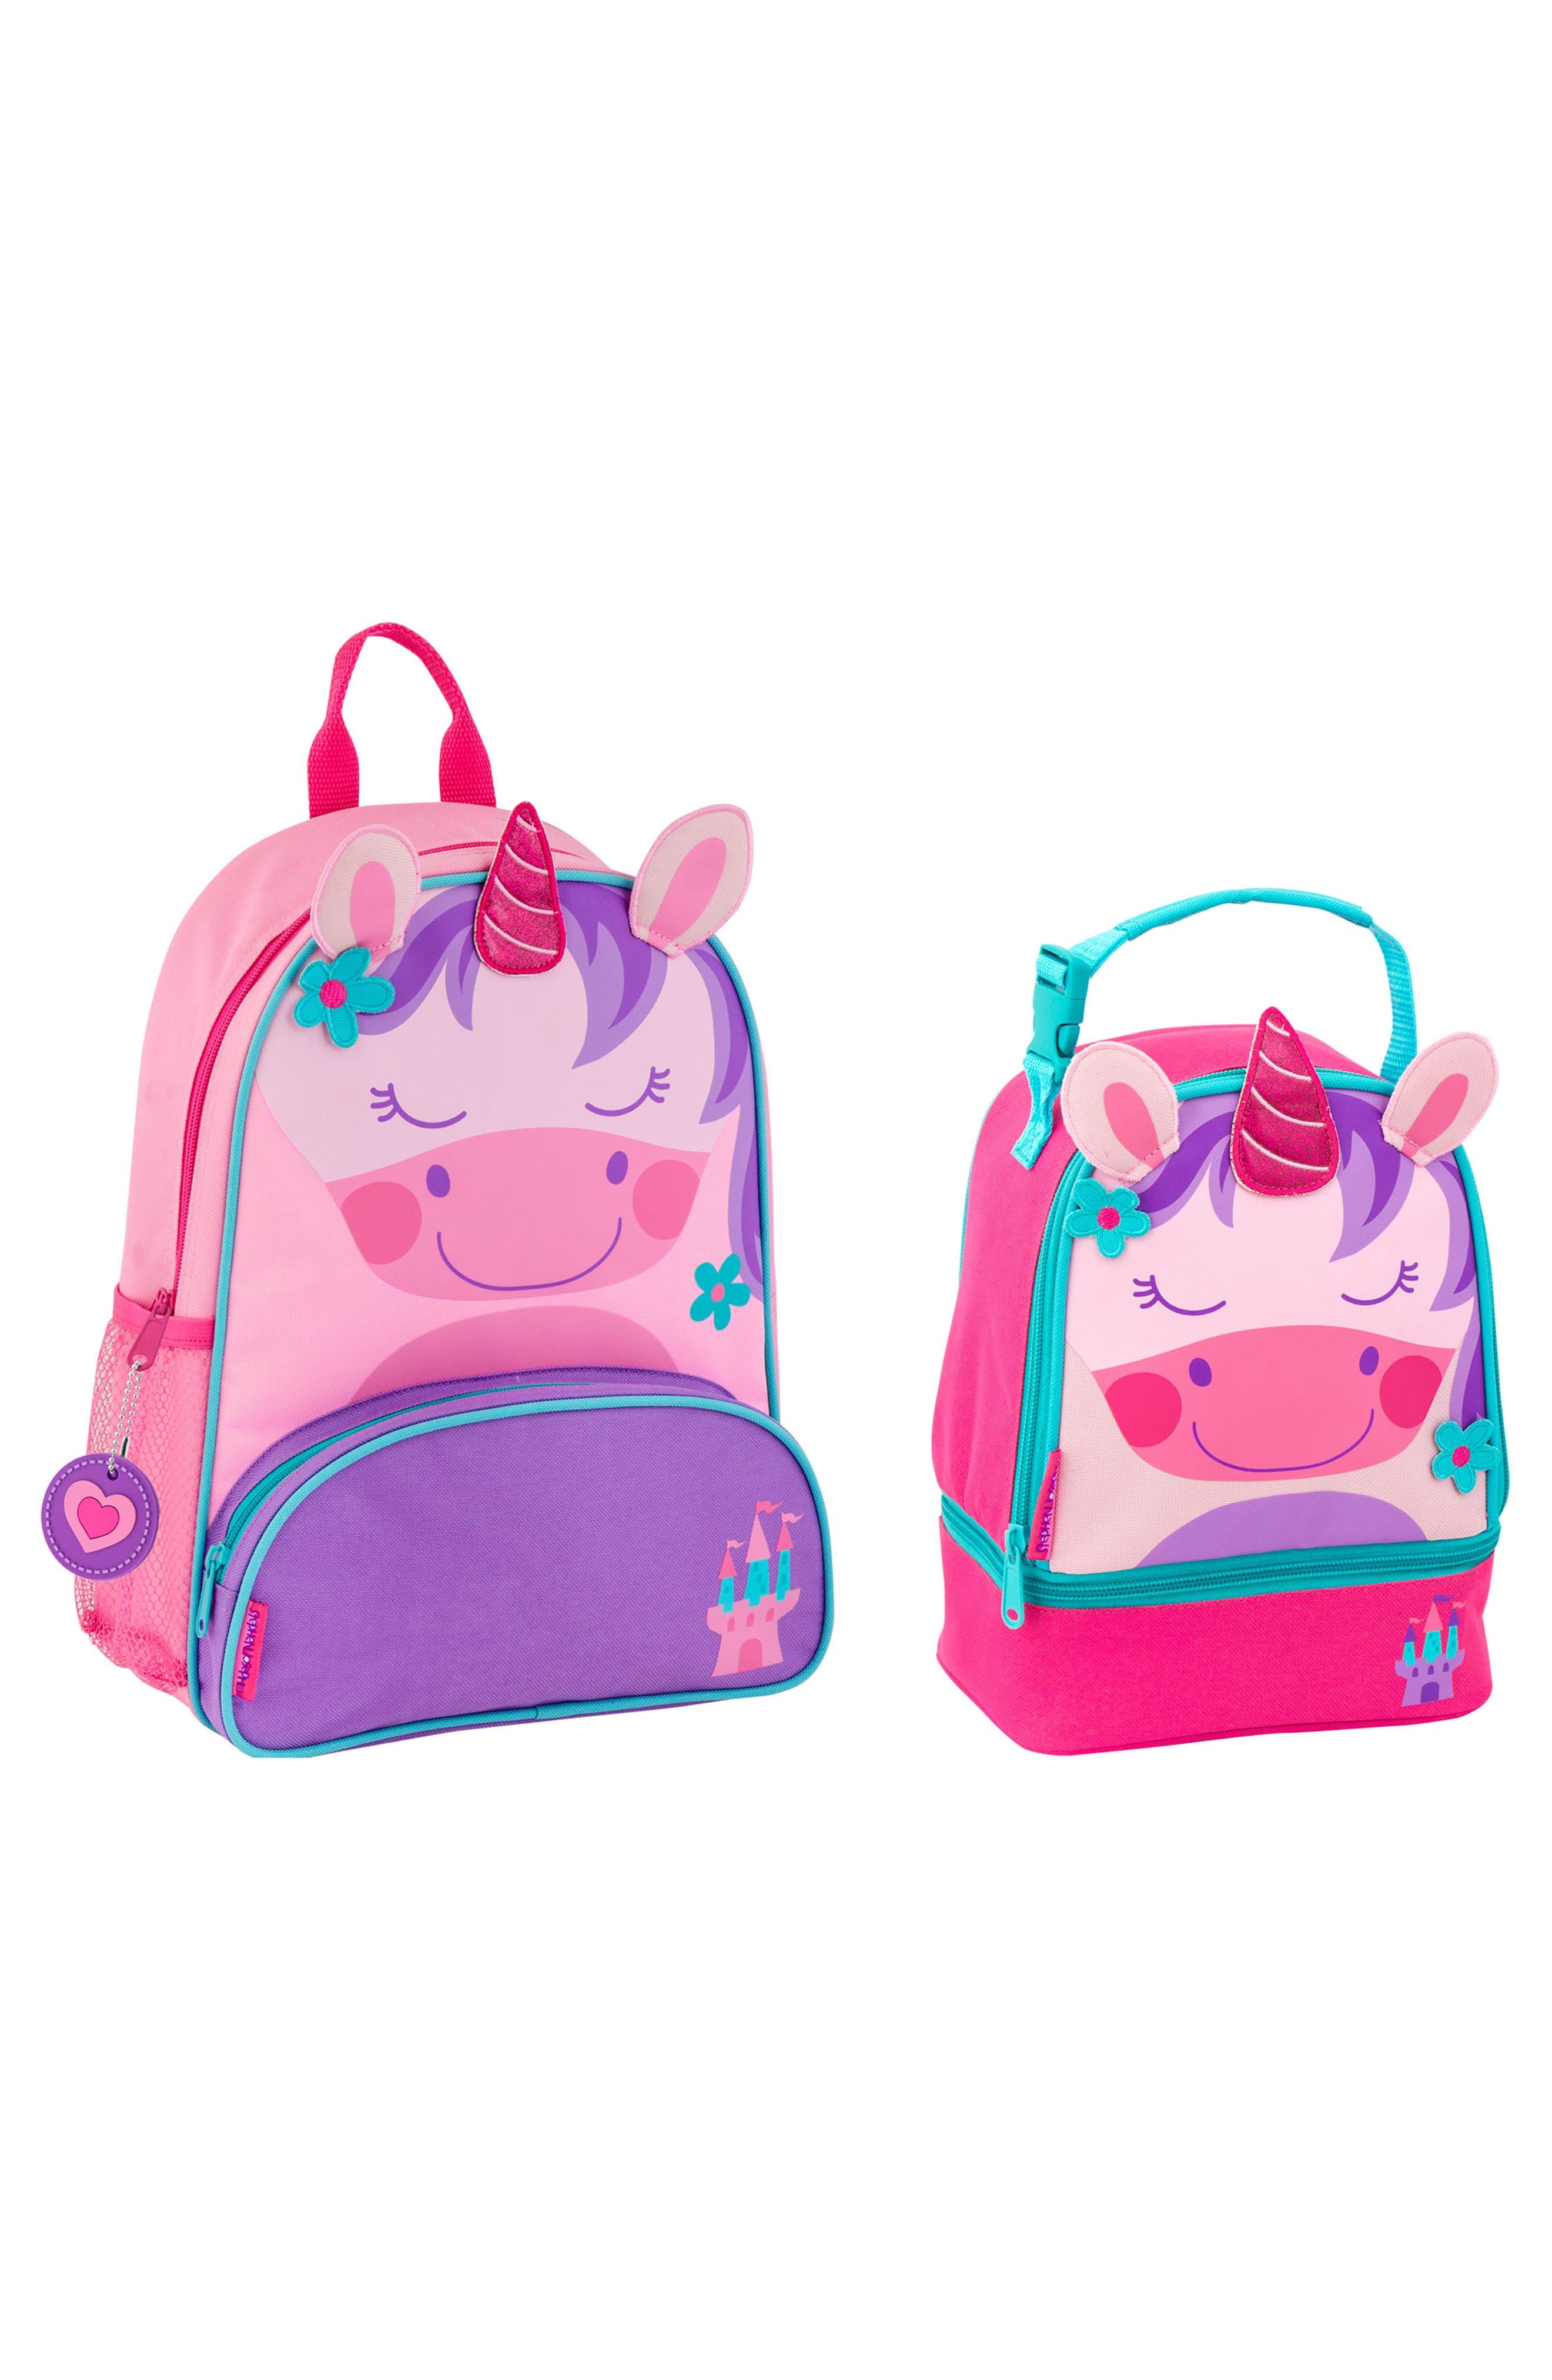 Girls Stephen Joseph Mermaid Sidekick Backpack  Lunch Pal  Purple